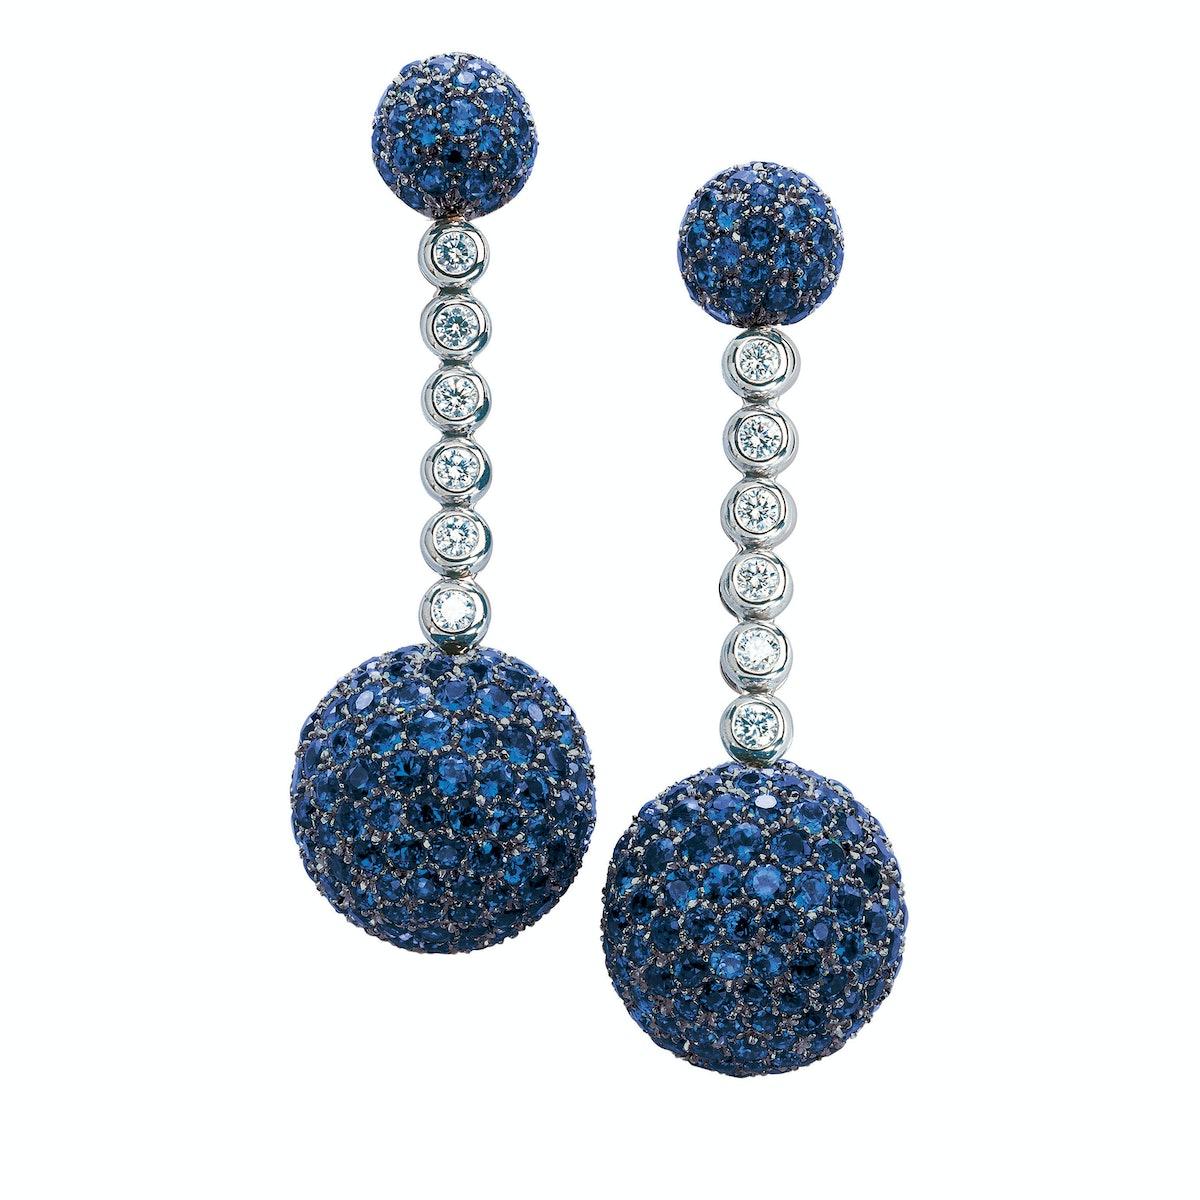 de Grisogono gold, sapphire, and diamond earrings